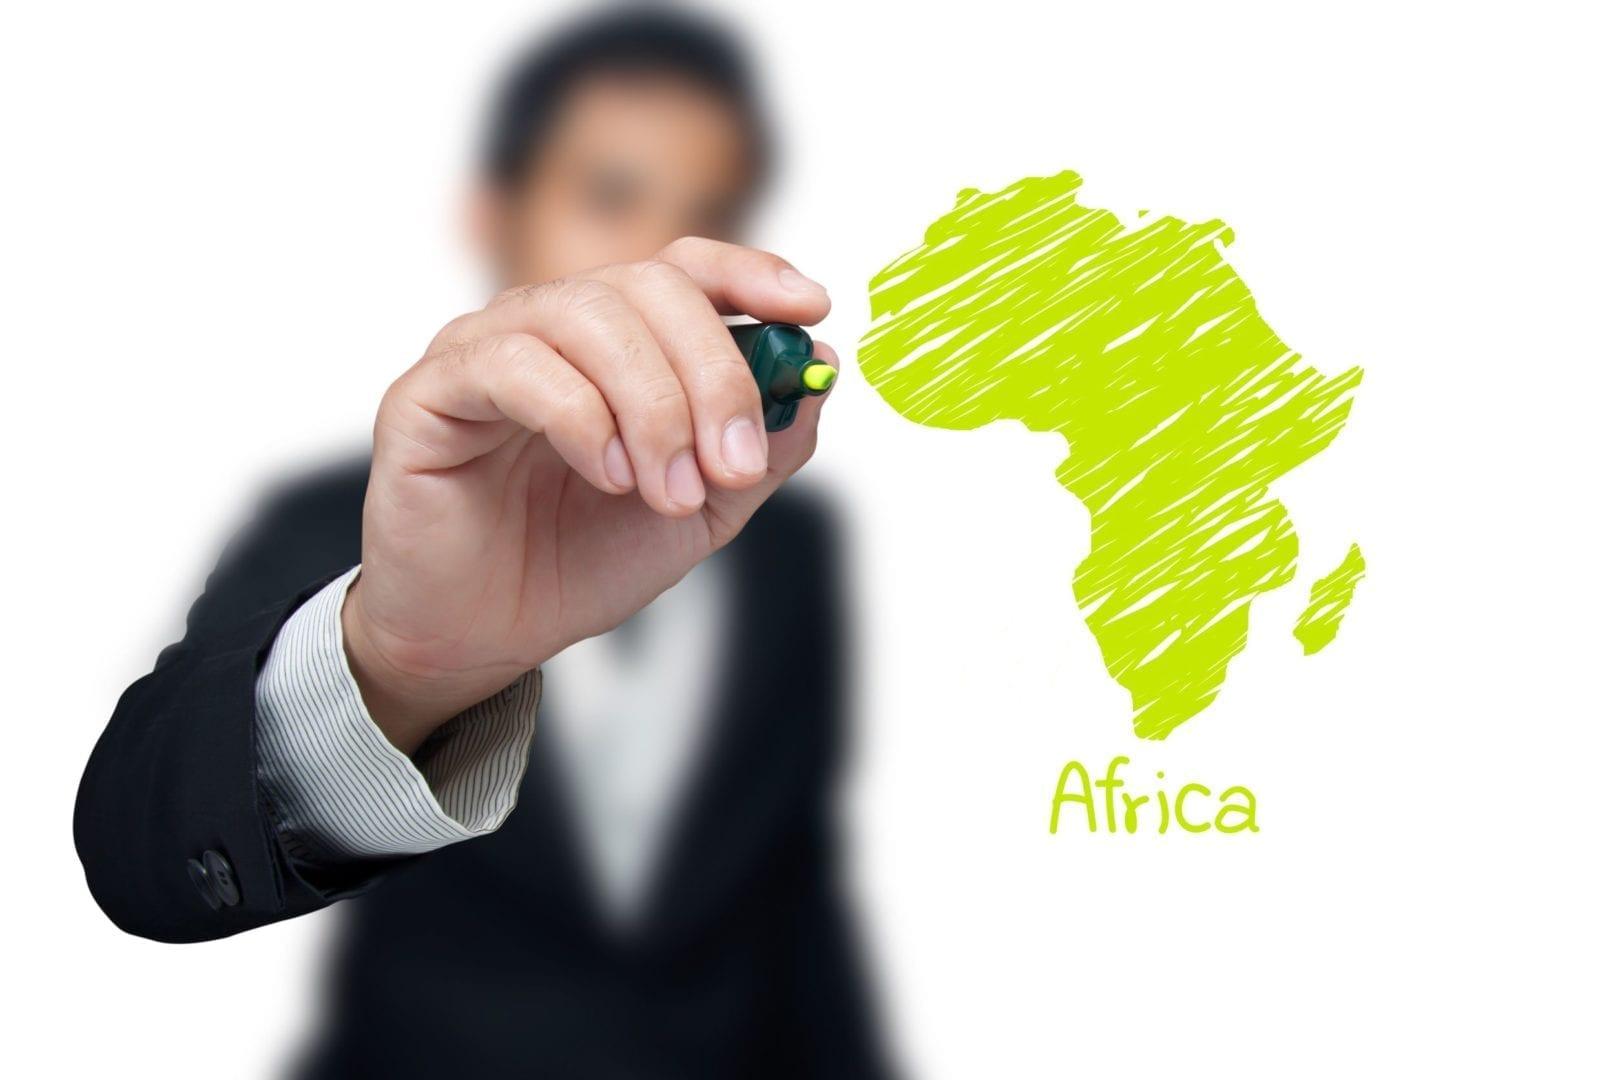 PwC SDGs analysis: Businesses remain on starting blocks for integration and progress